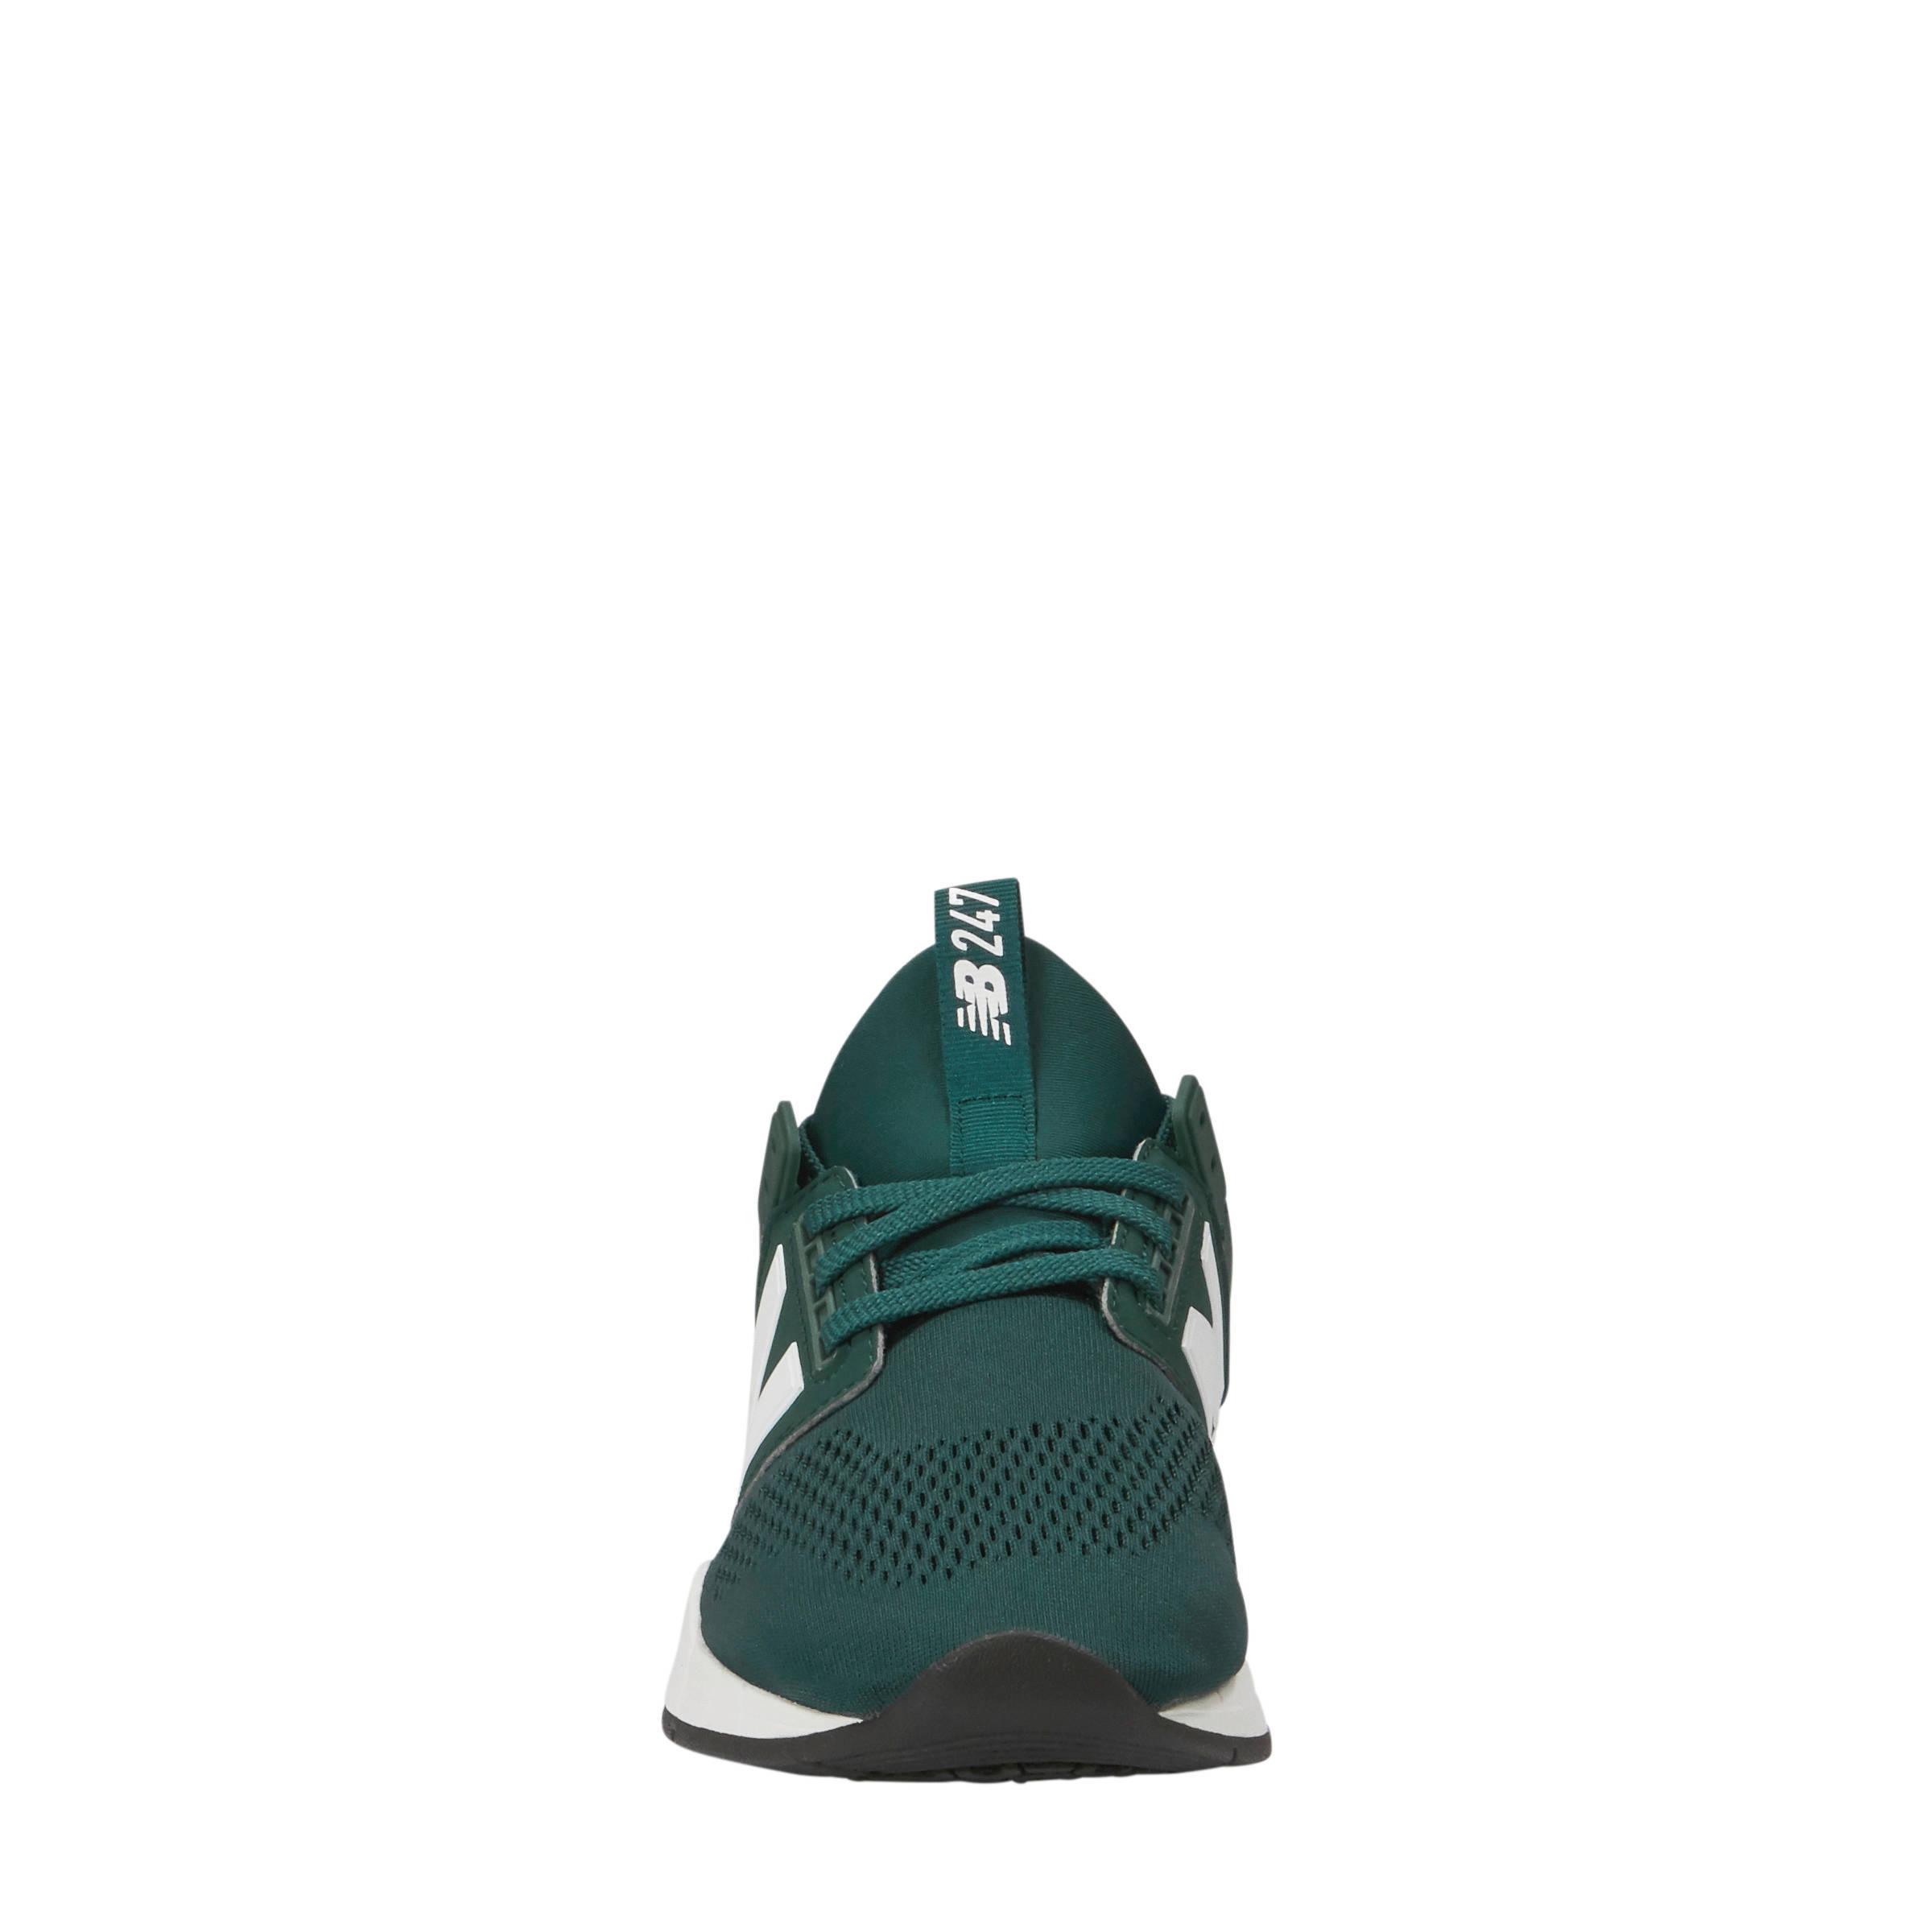 New Balance MS247 sneaker donkergroen   wehkamp